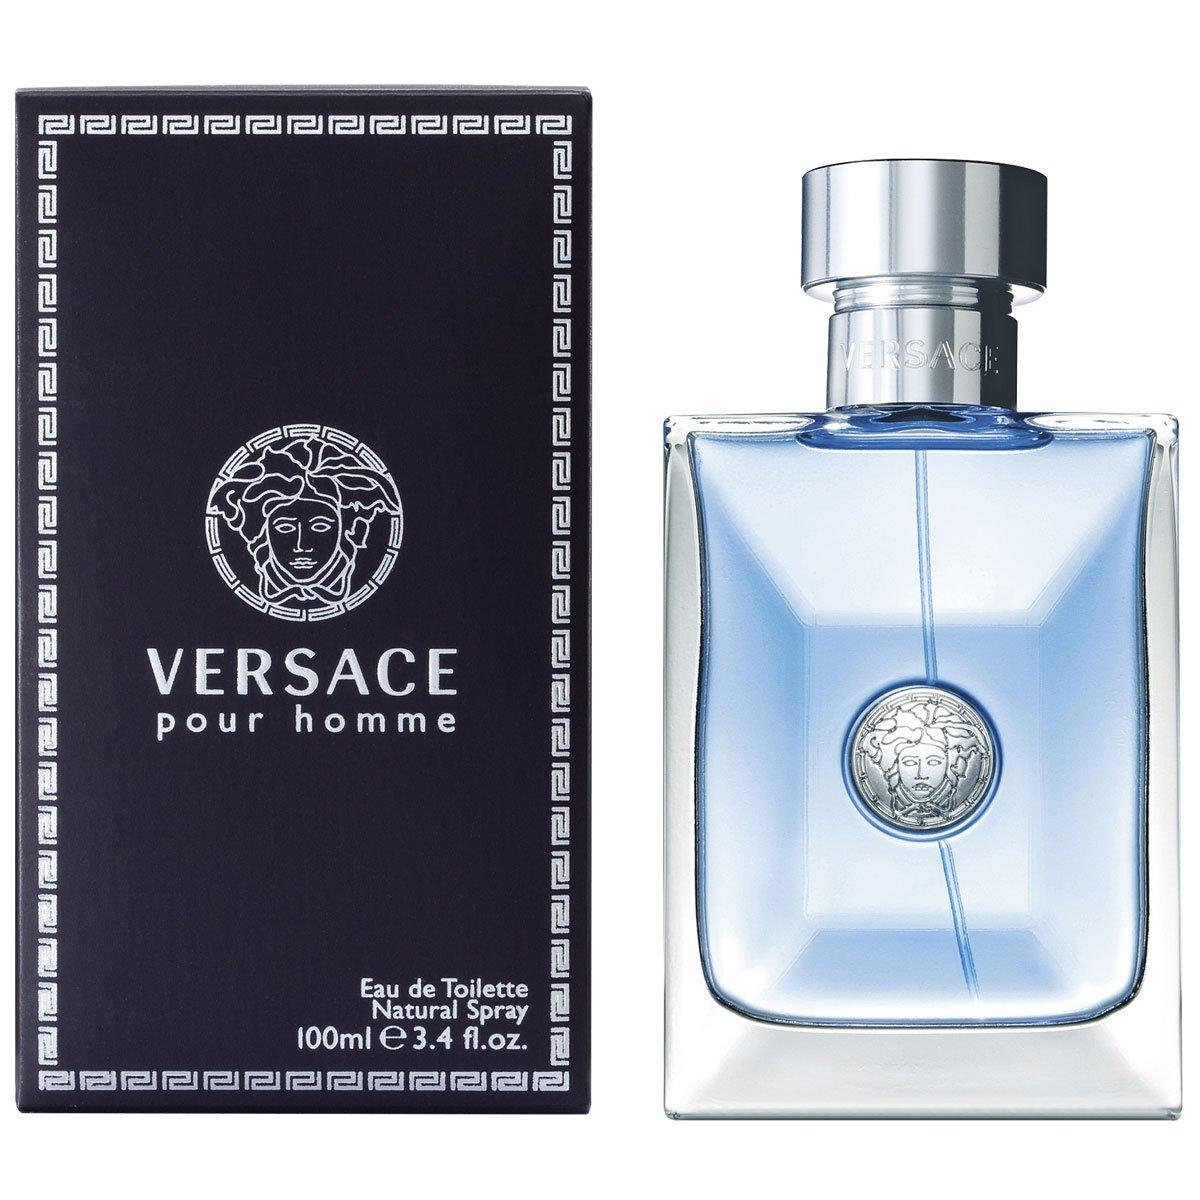 Versace para Hombre (100Ml) Edt